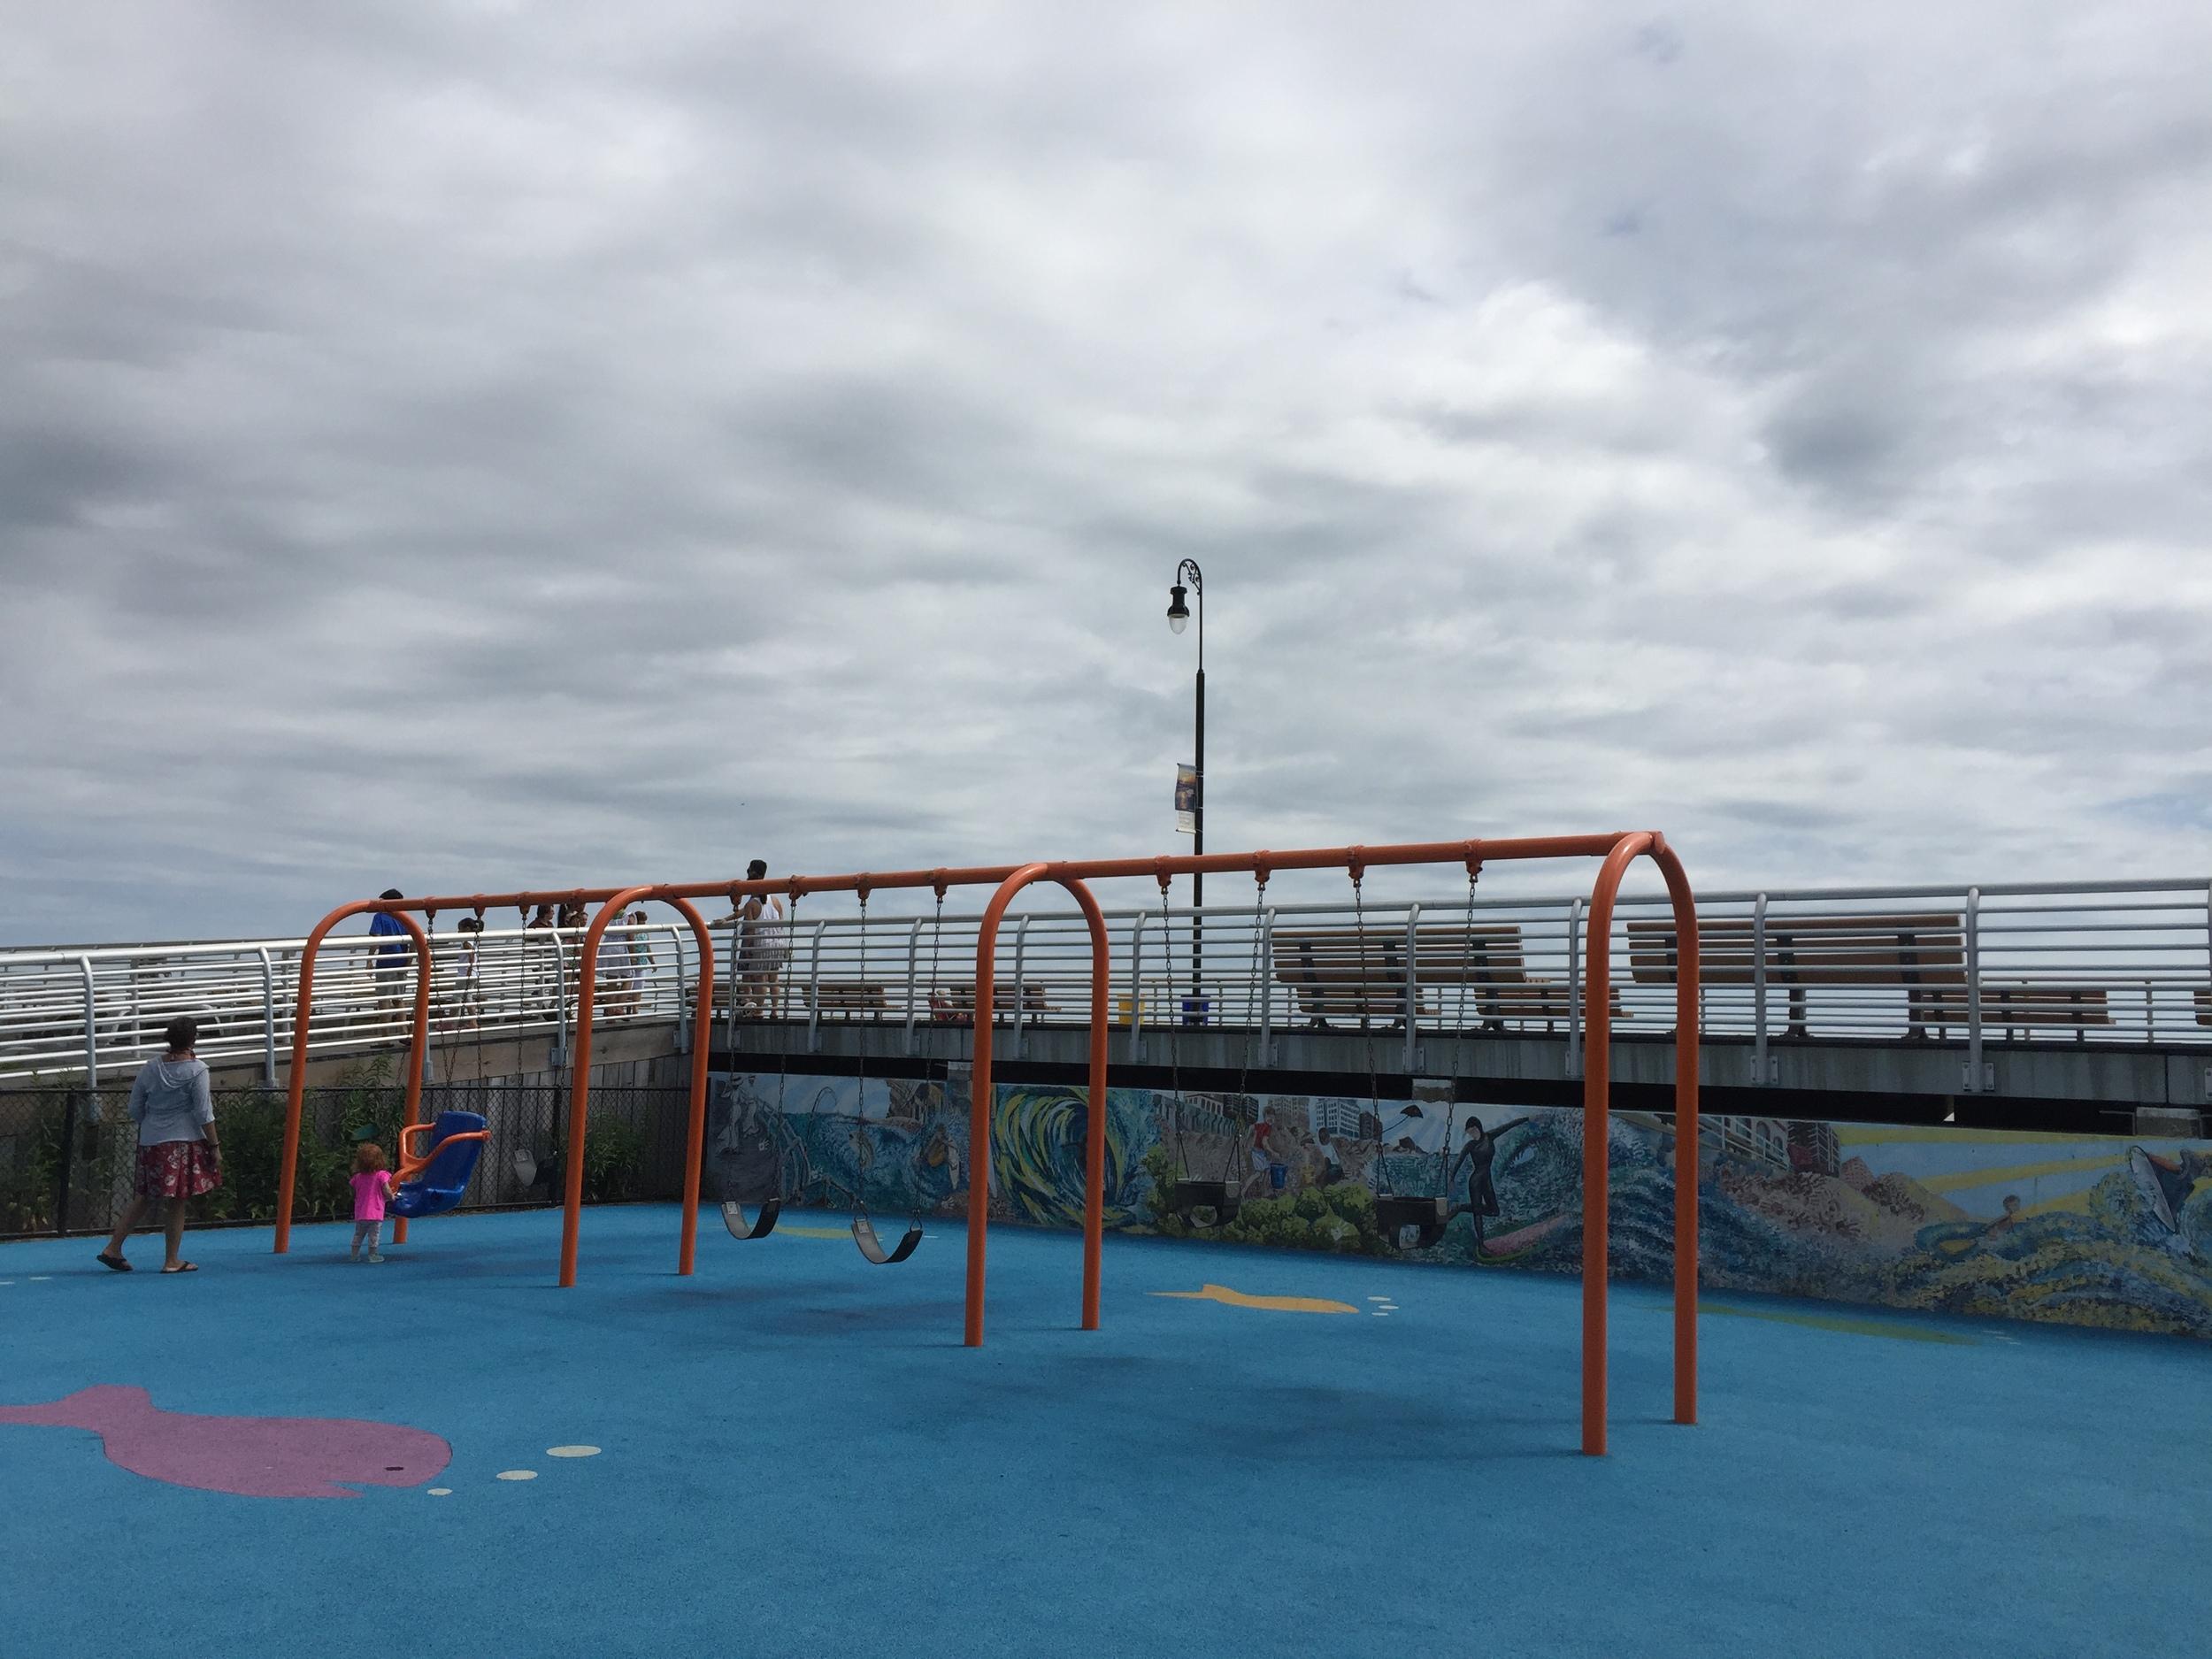 Swings at Magnolia Playground